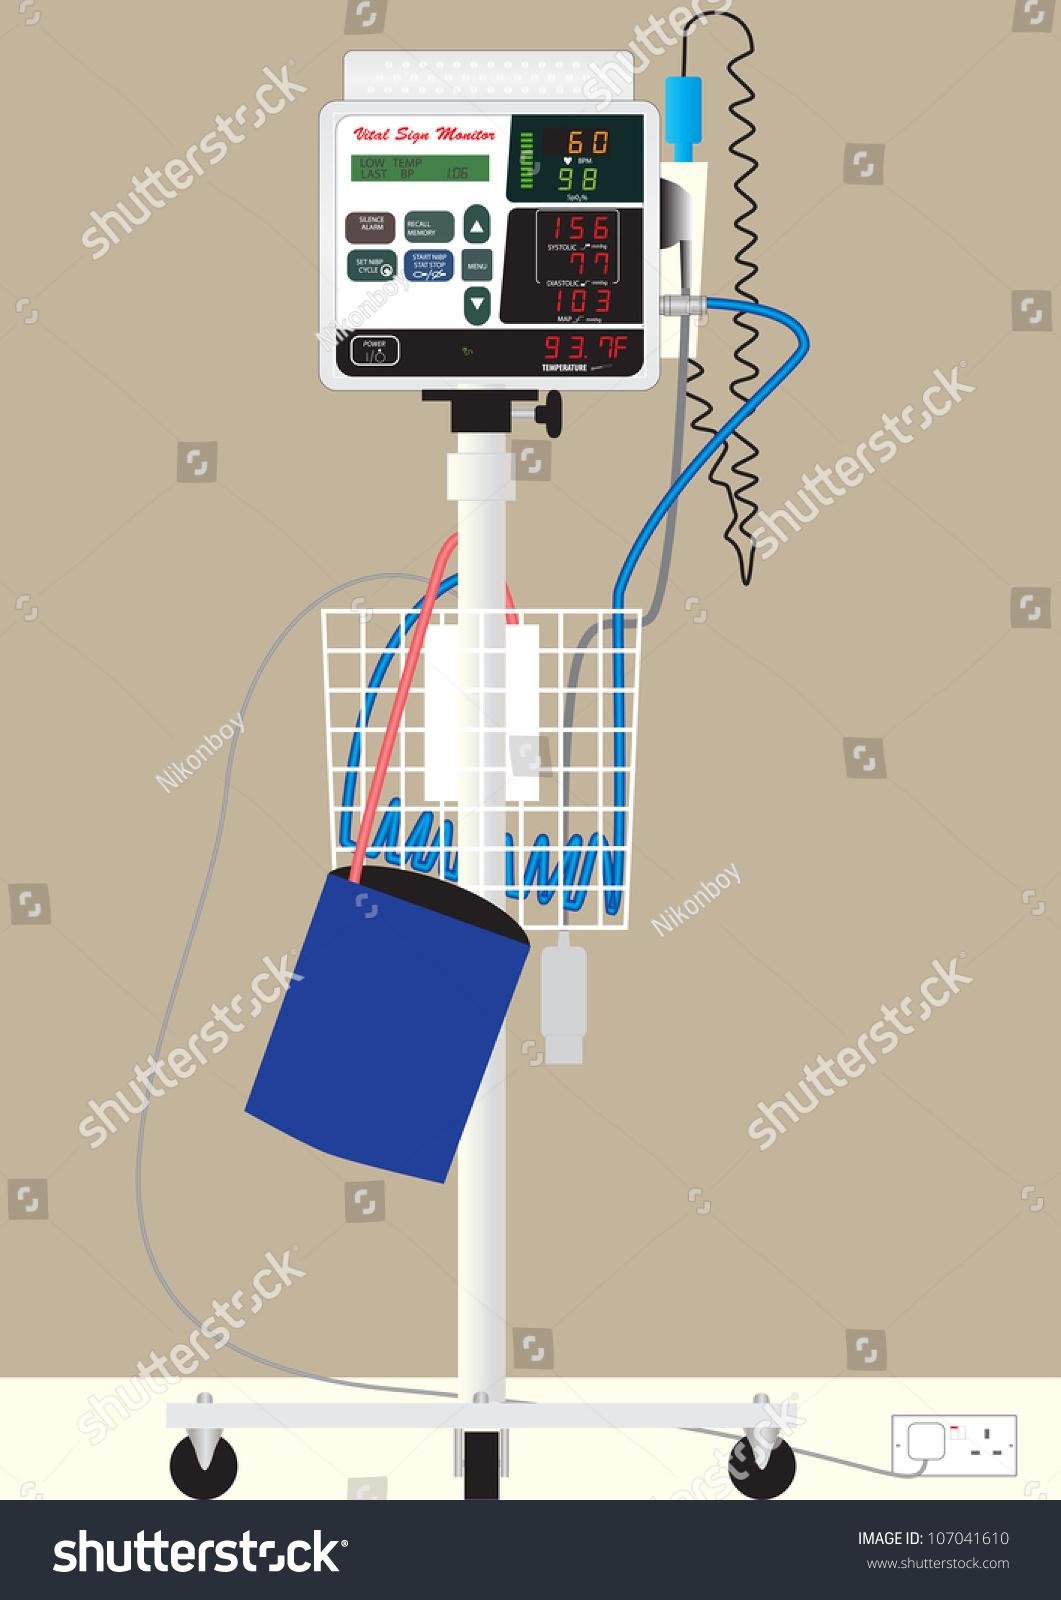 Hospital Vital Sign Monitor On Trolley Stock Vector